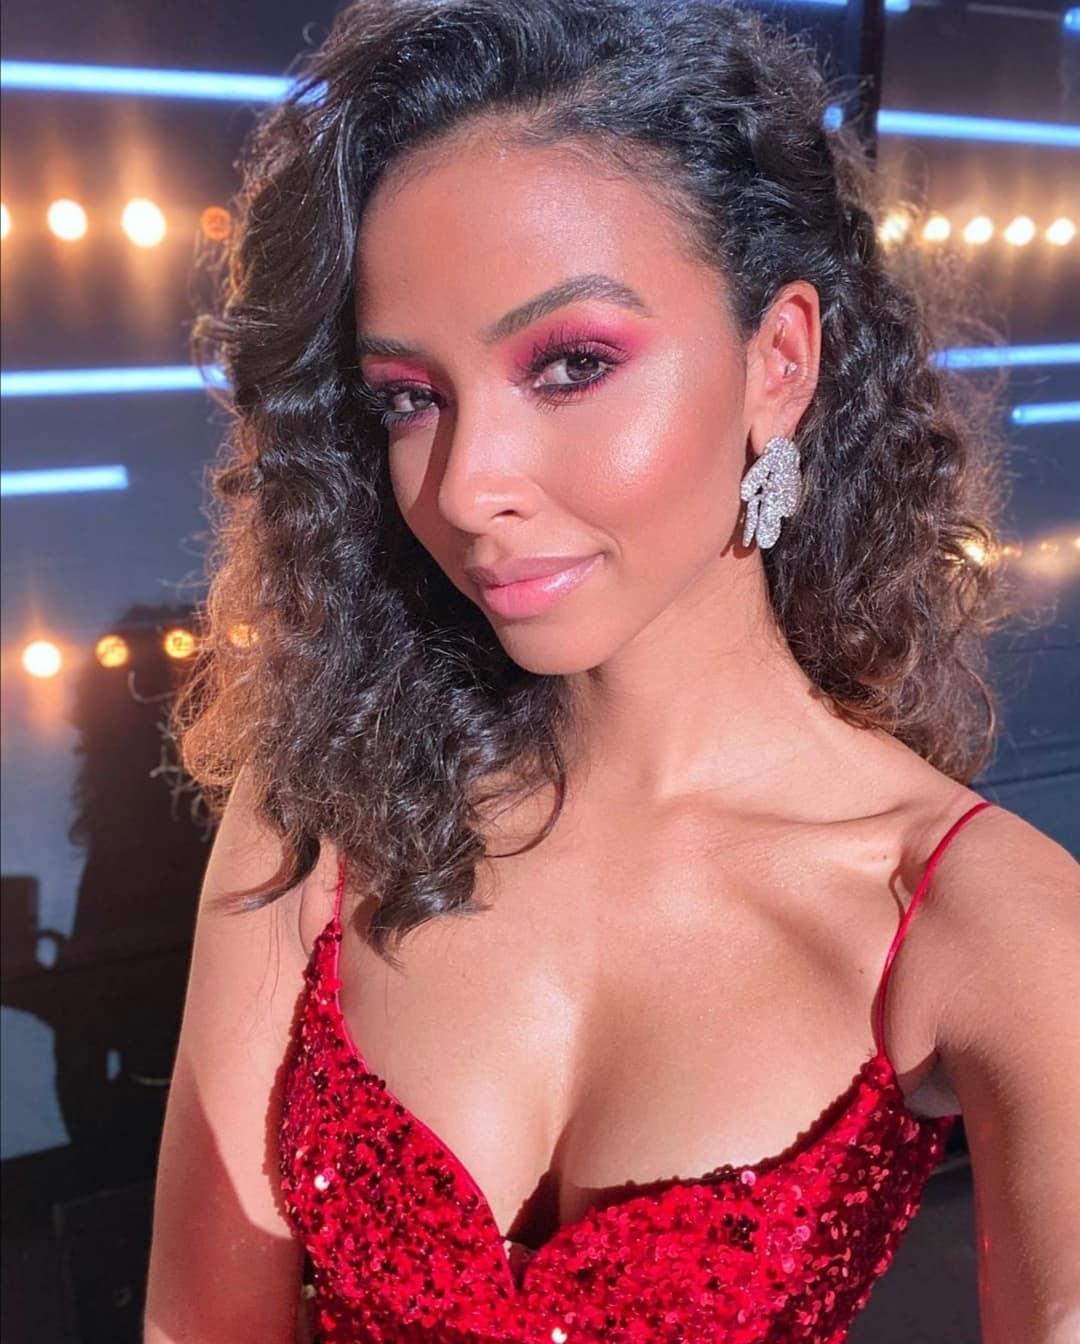 Makeup - maquillage - Flora Coquerel